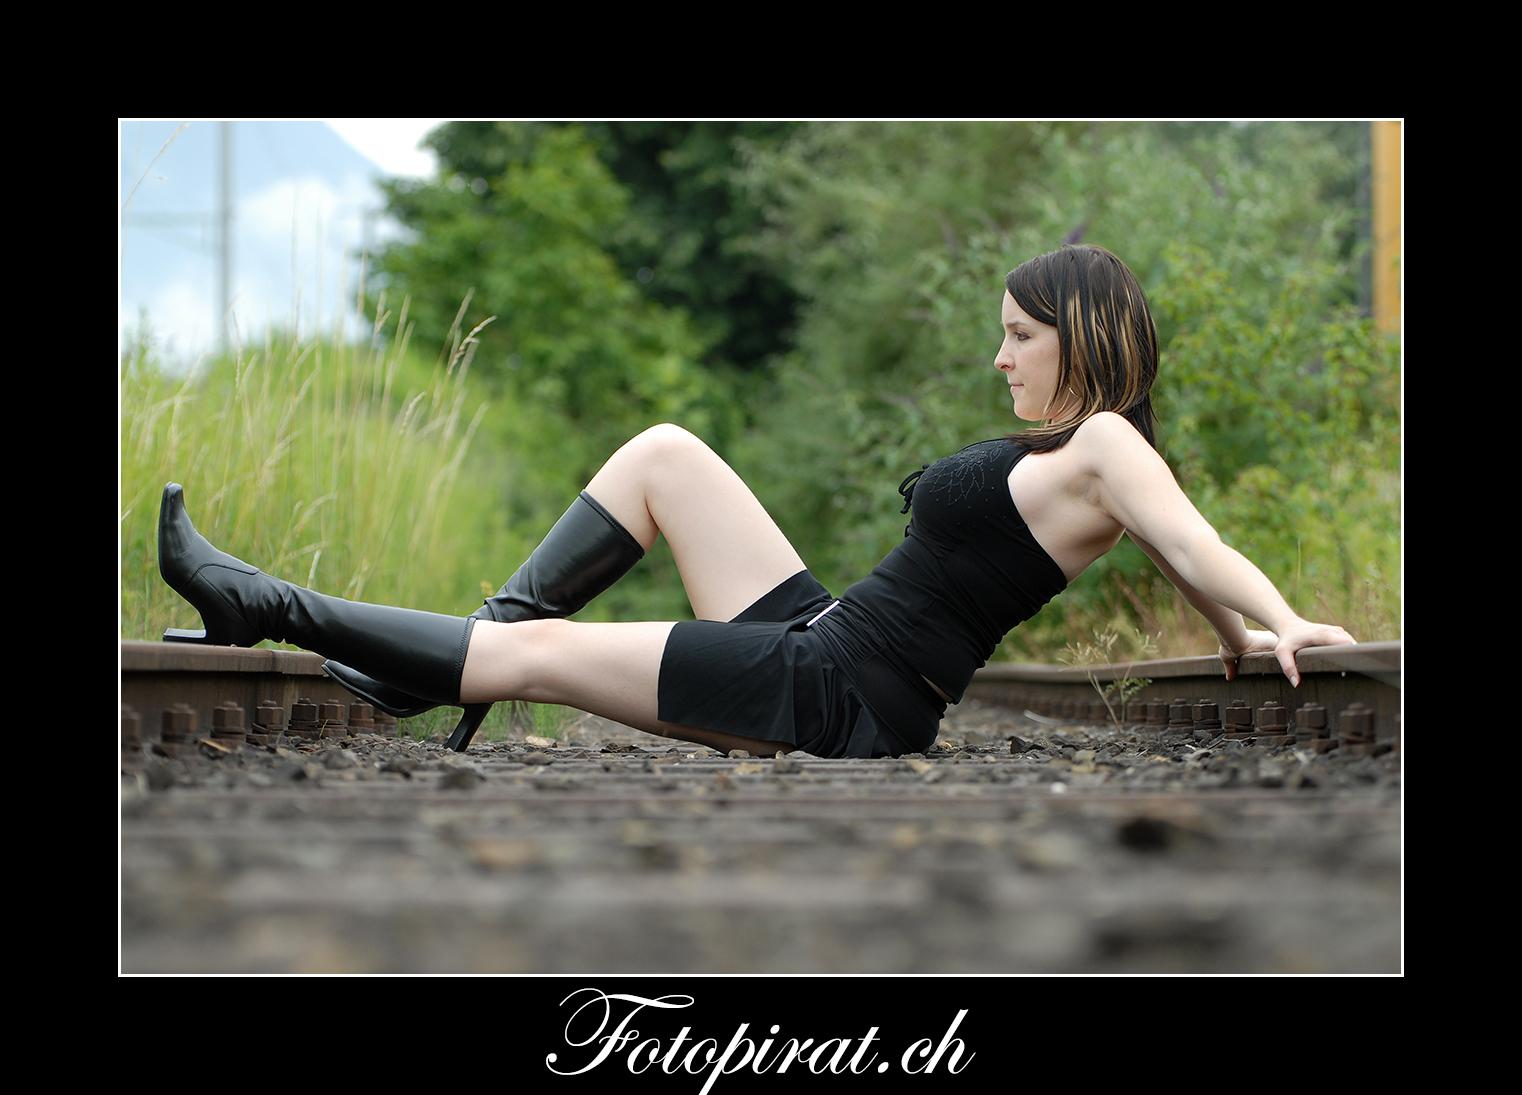 Fotoshooting, outdoor, Modelagentur, sexy Model, Sportmodel, Fitnessmodel, grosse Brüste, schwarze Stiefel